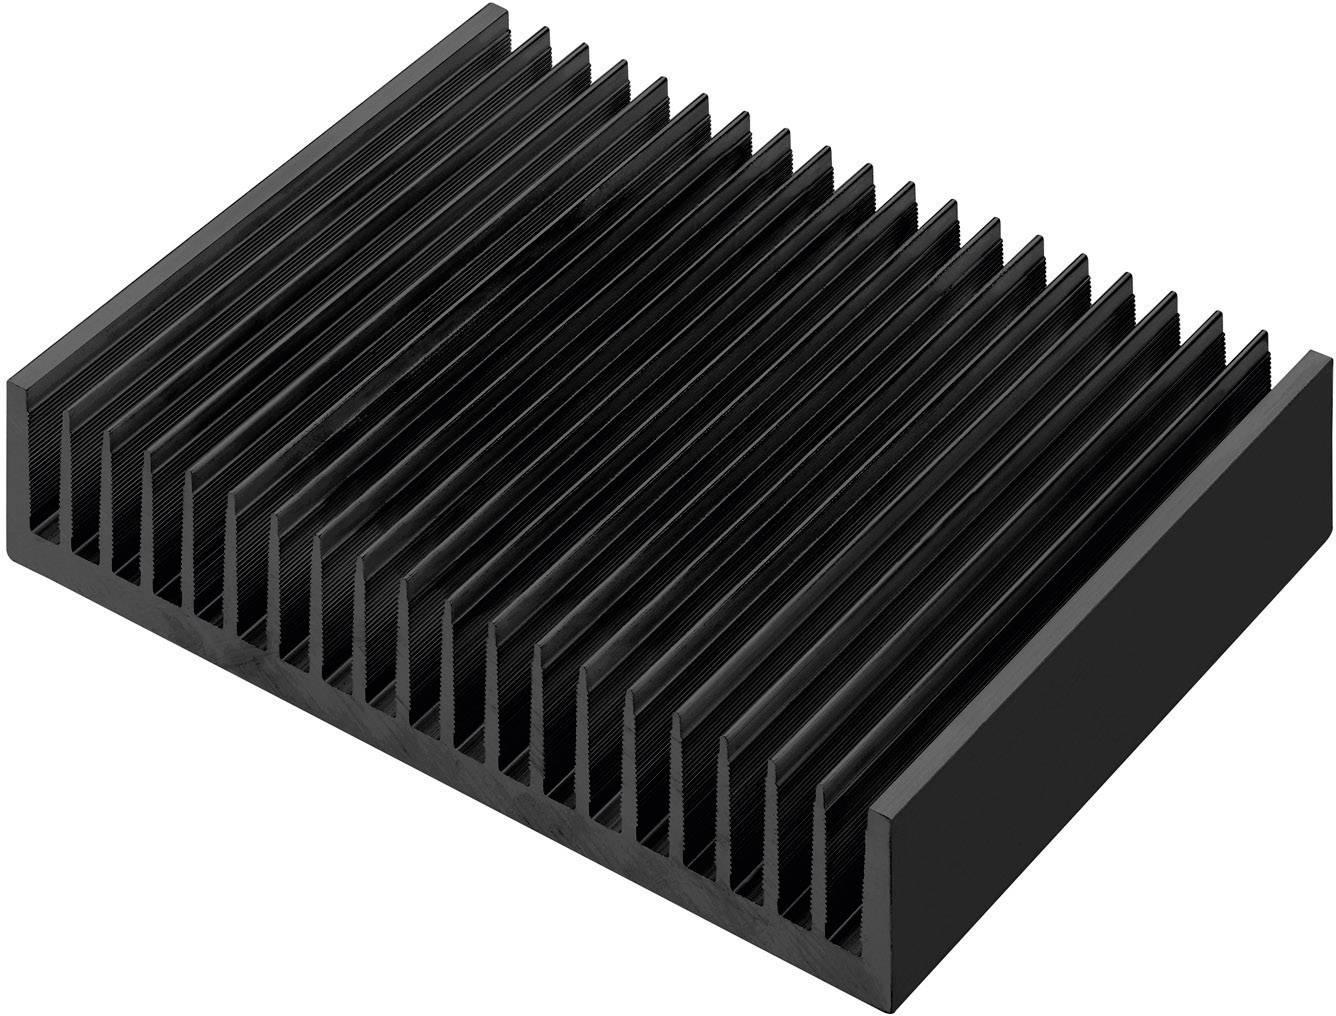 Profilový chladič Pada Engineering 8071/75/N 8071/75/N, 1.06 K/W, (d x š x v) 75 x 200 x 40 mm